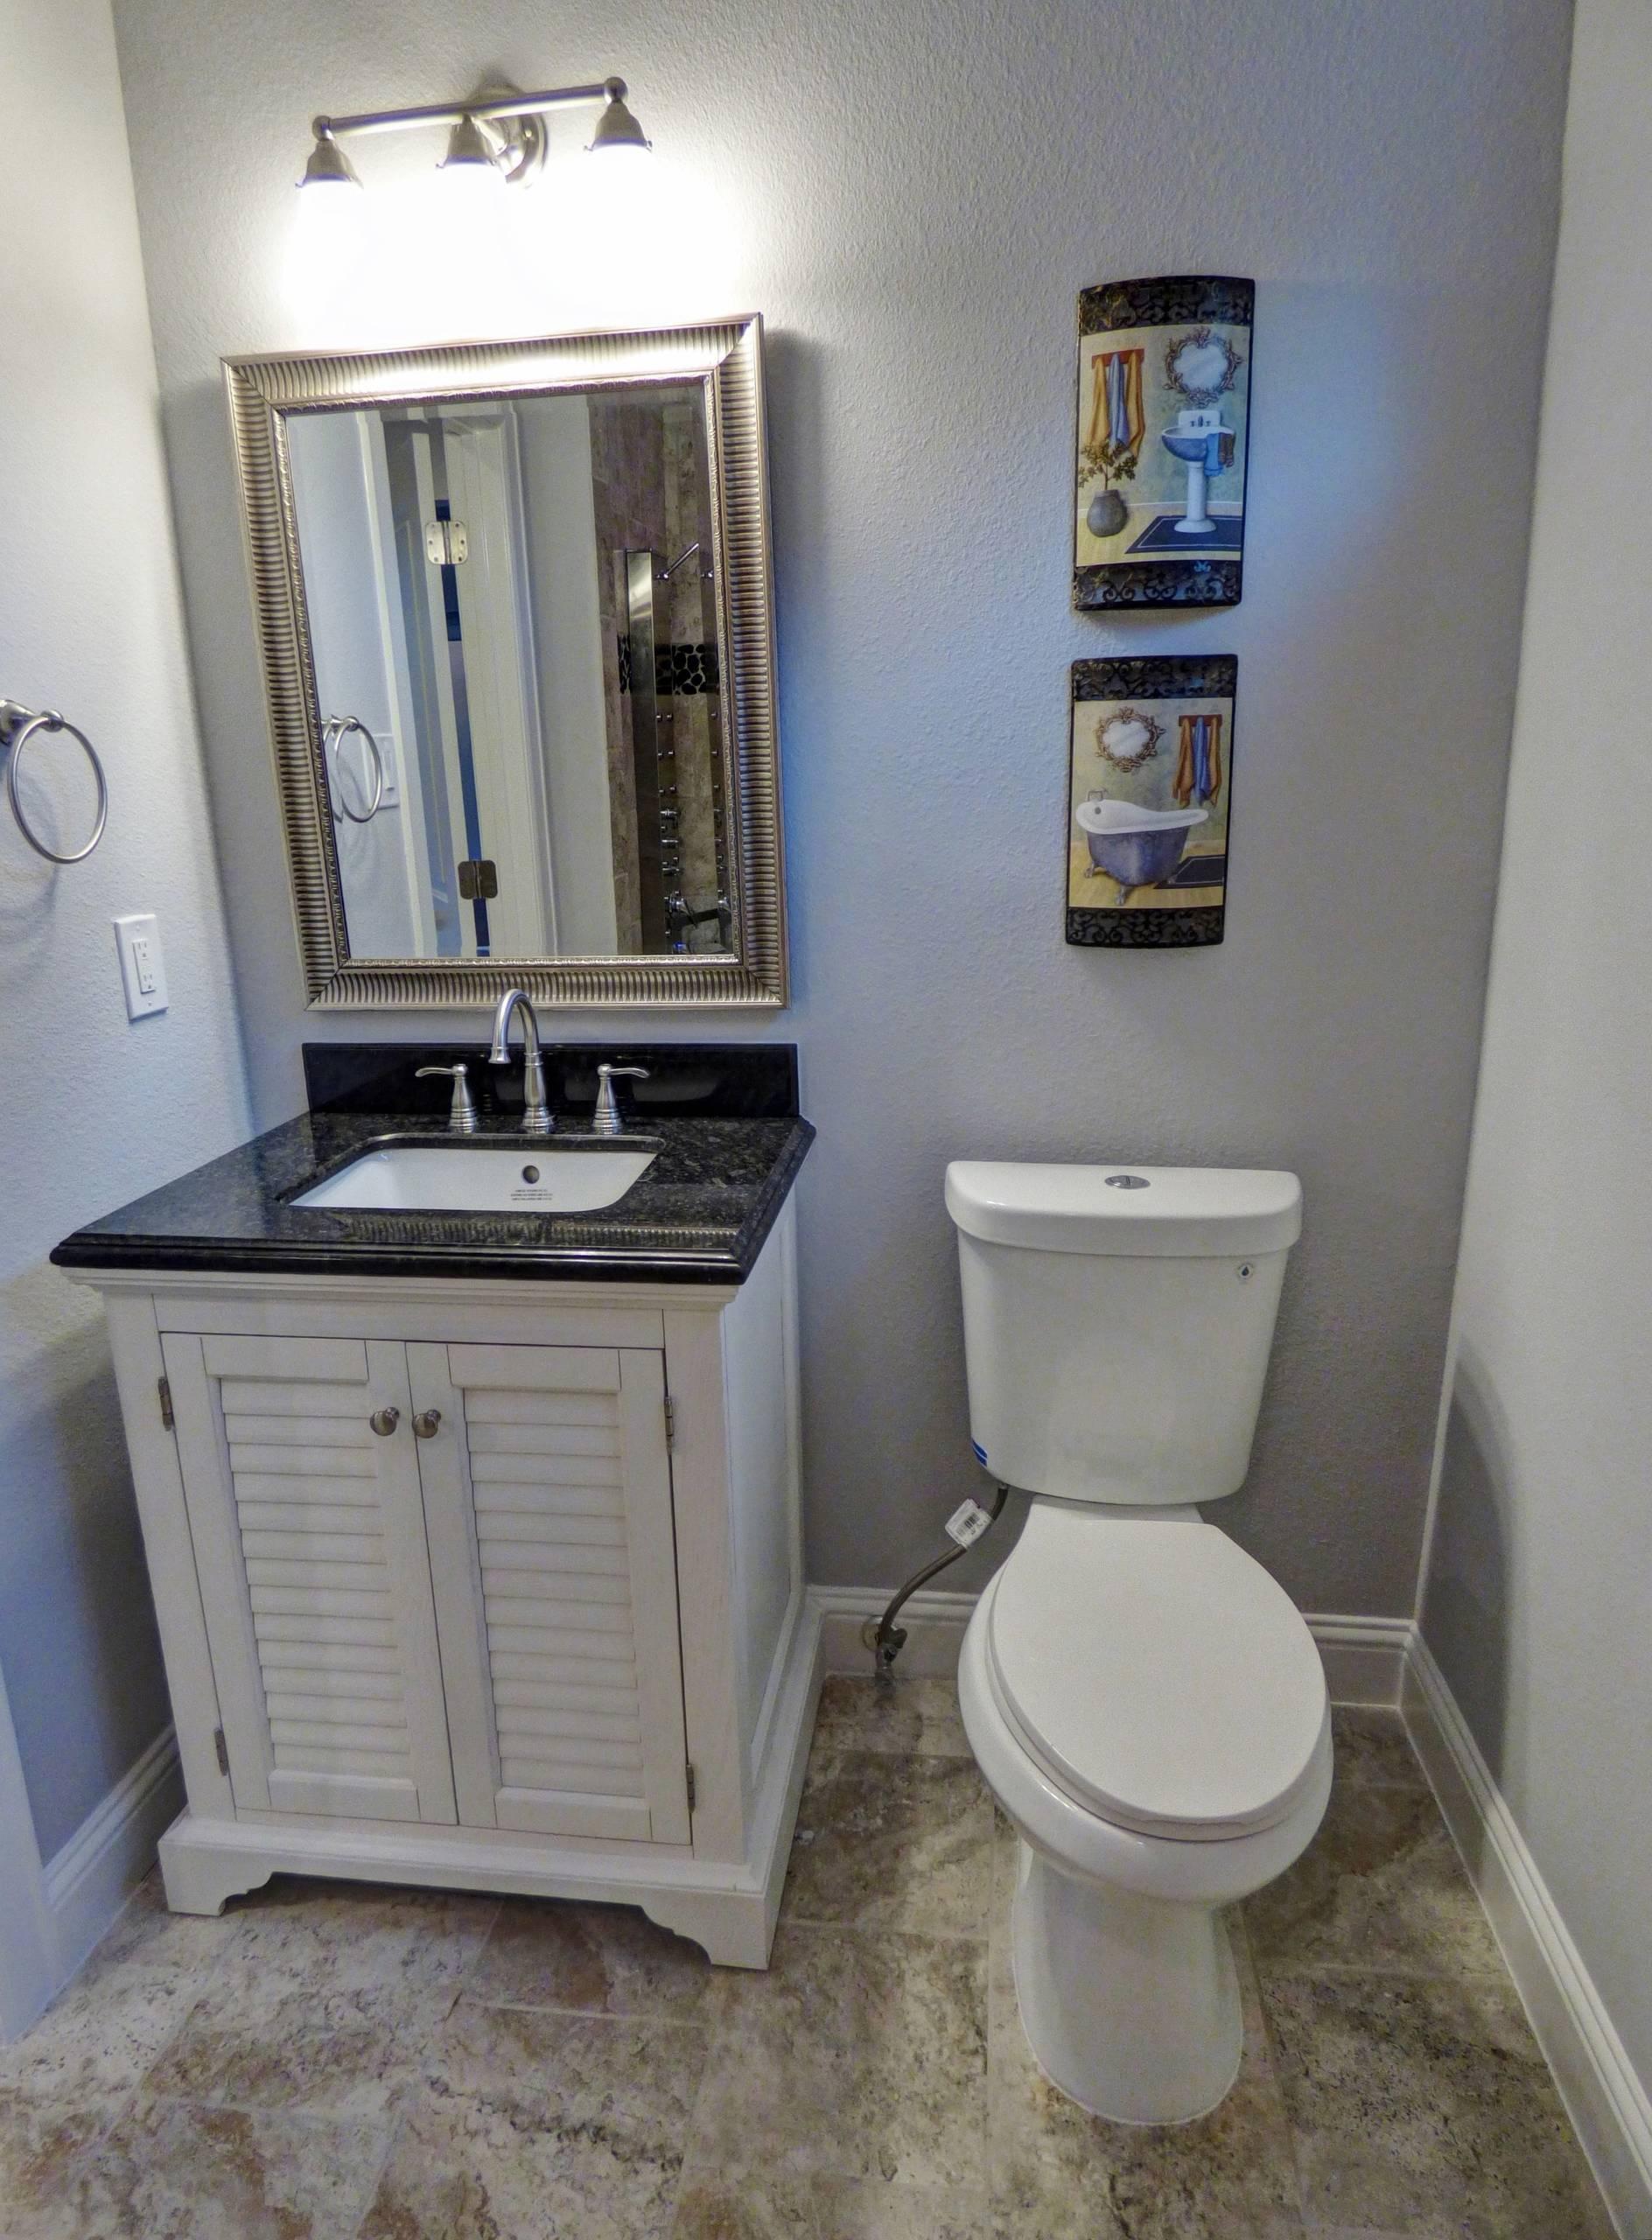 The Oasis of Westbury Man's Master Bathroom 2